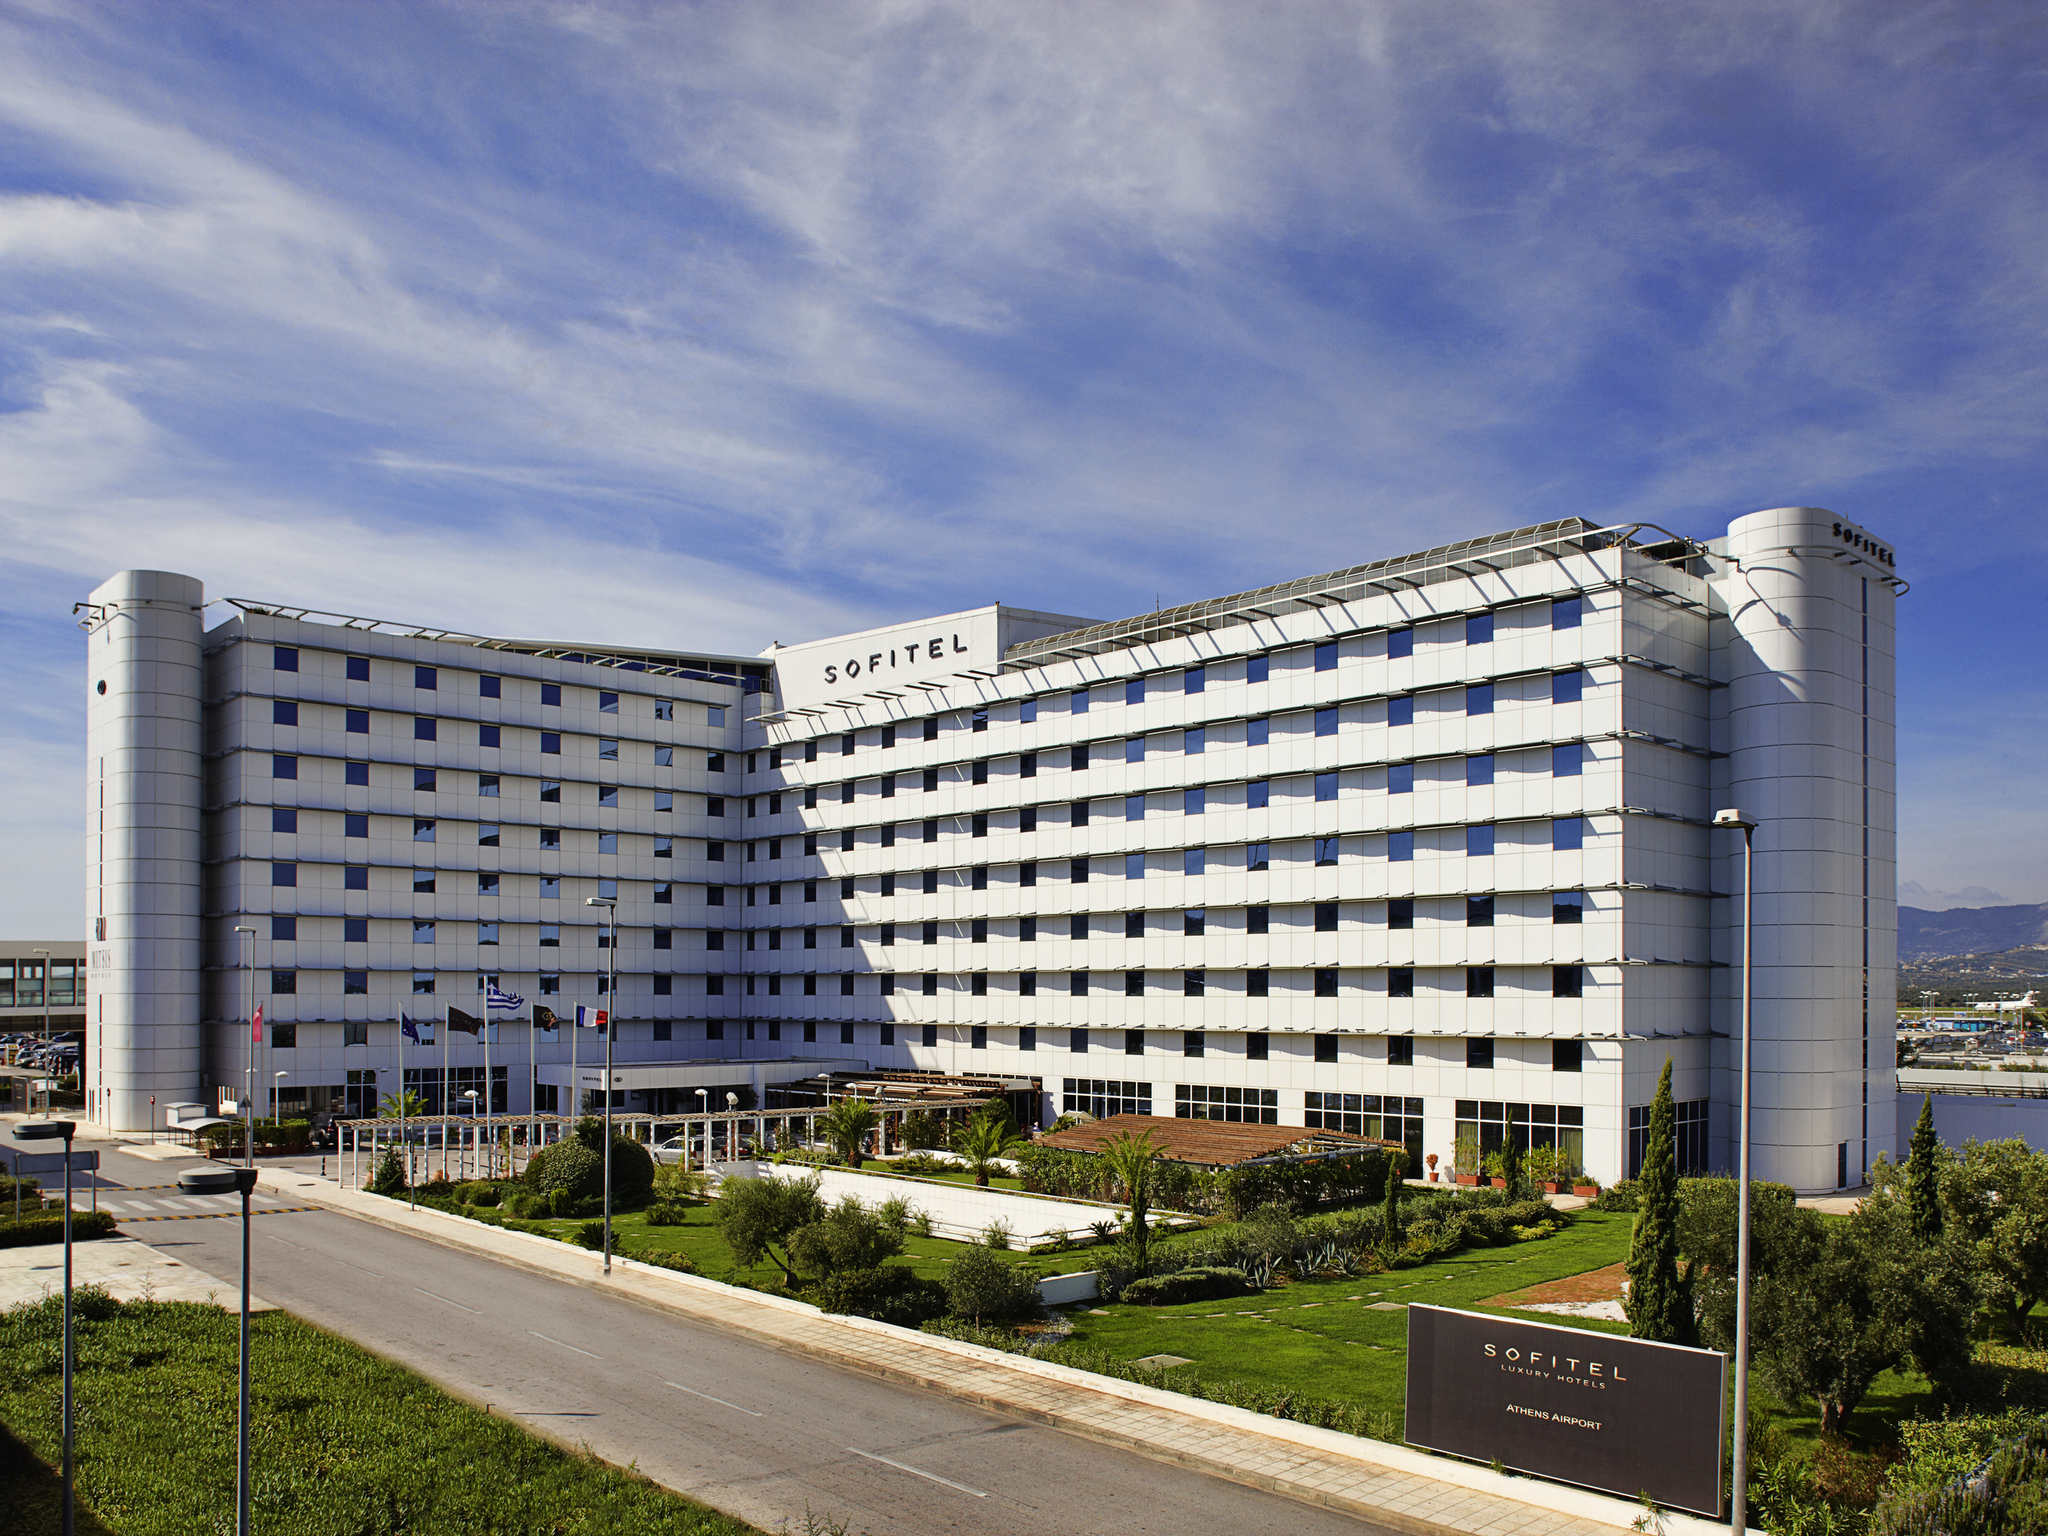 Hôtel - Sofitel Athens Airport